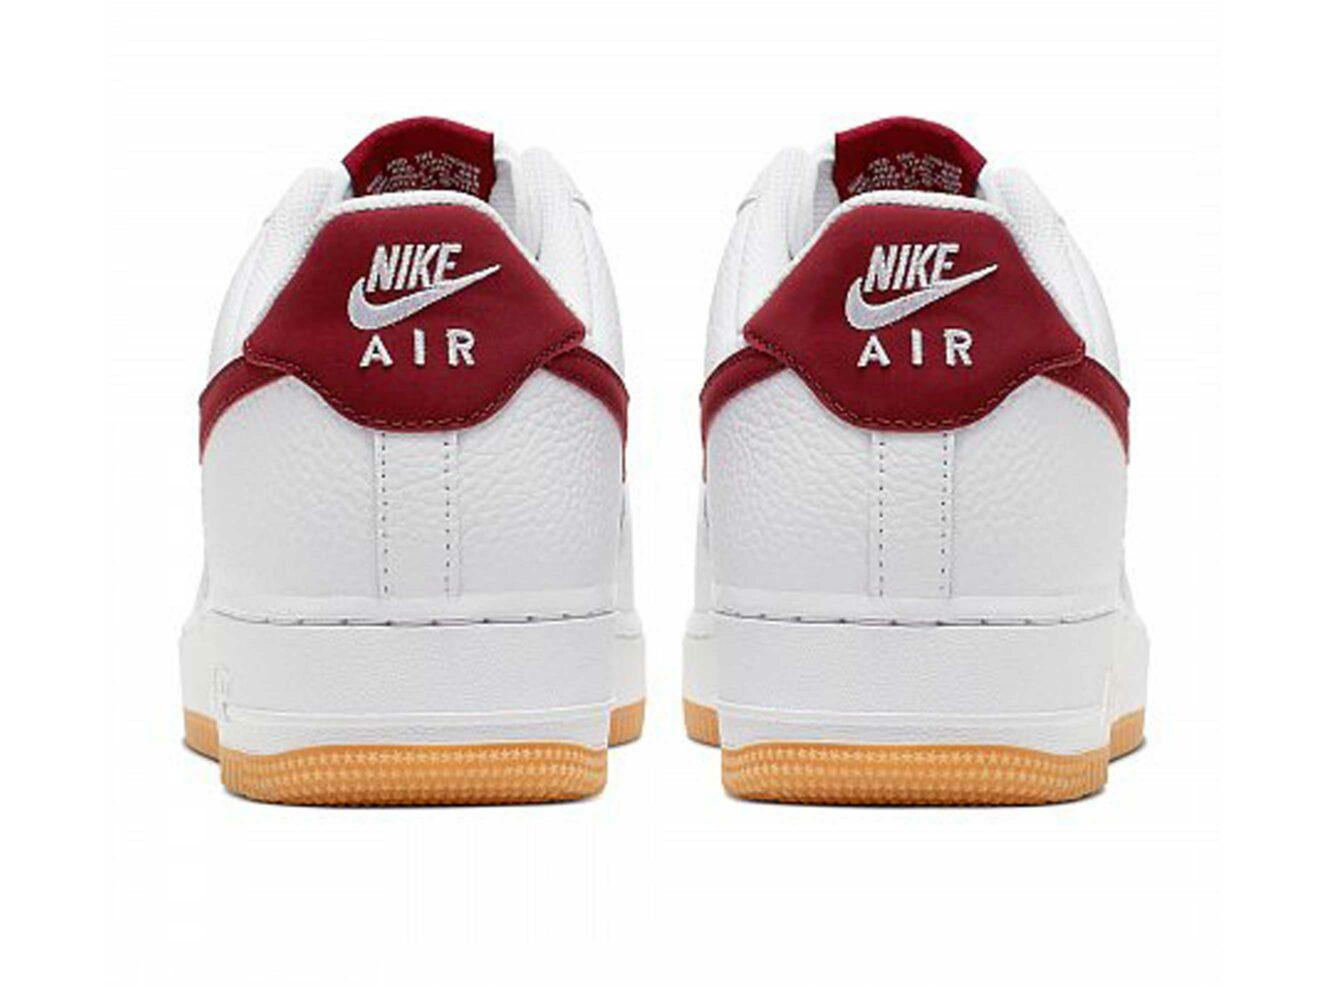 nike air force 1 low white red gum Cl0057_101 купить